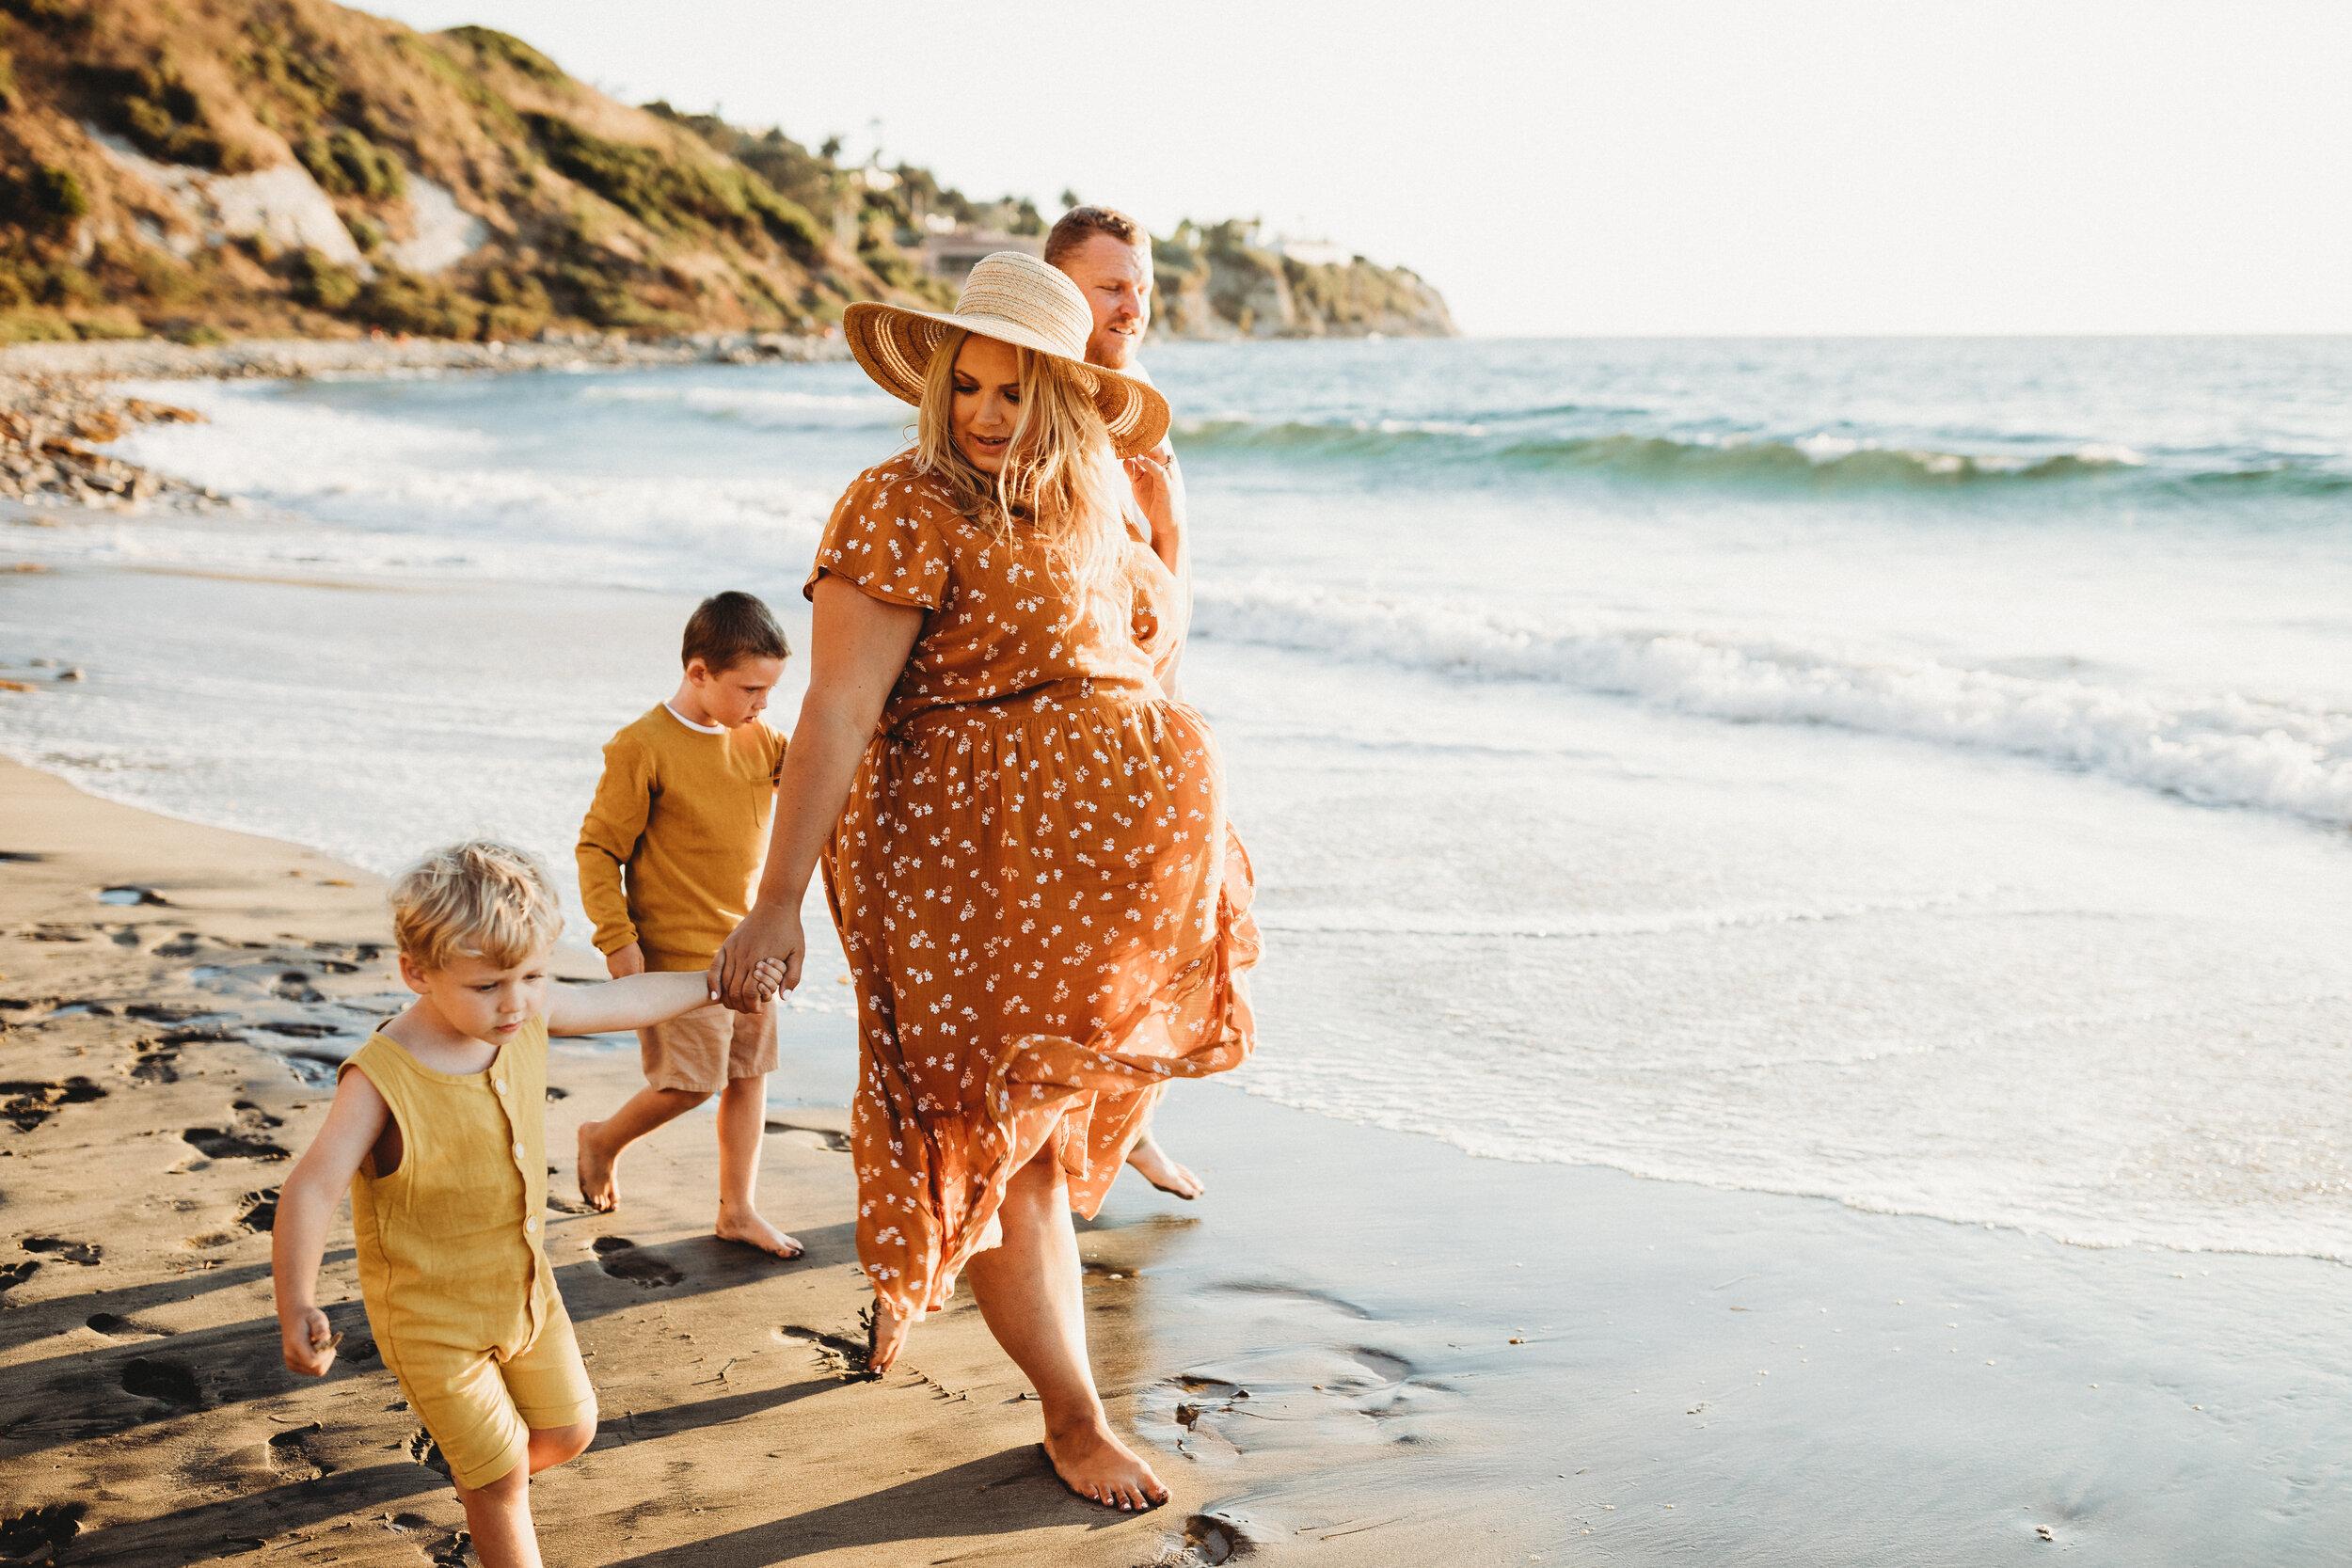 maternity photoshoot on the beach - Lindsay Petty Photography